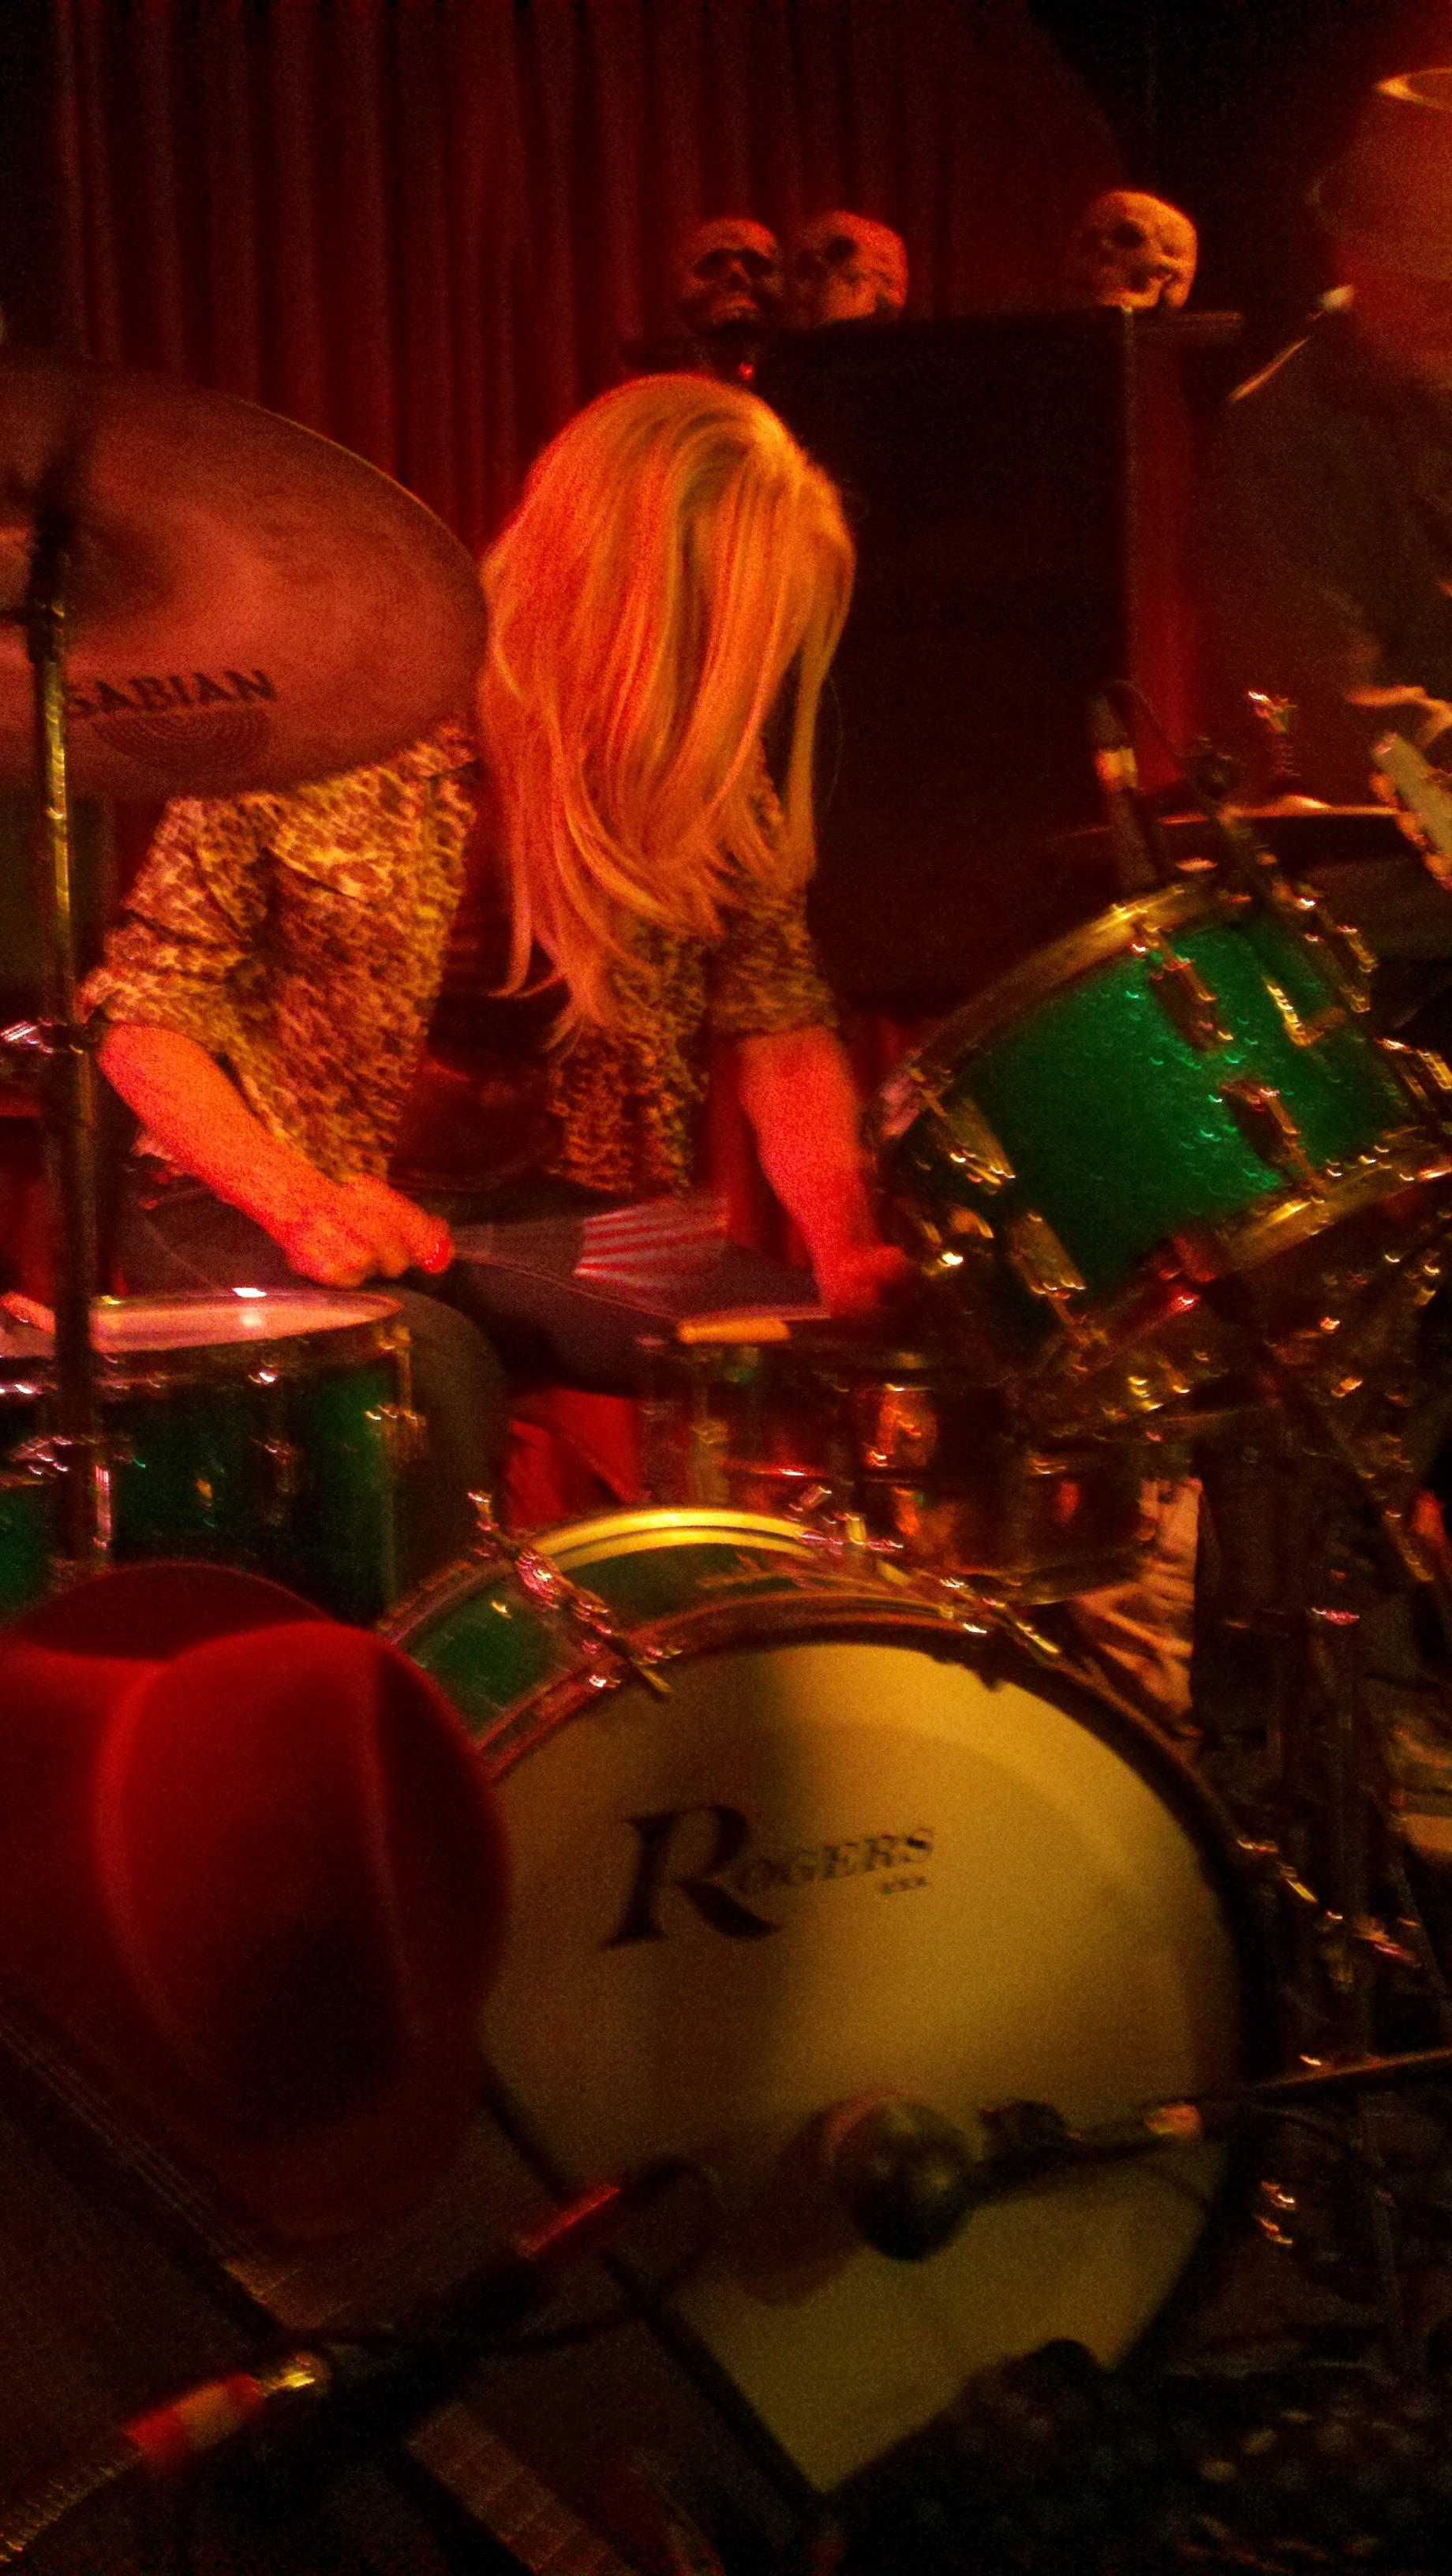 Rikki @ Alabama Music Box in Mobile, AL 2011